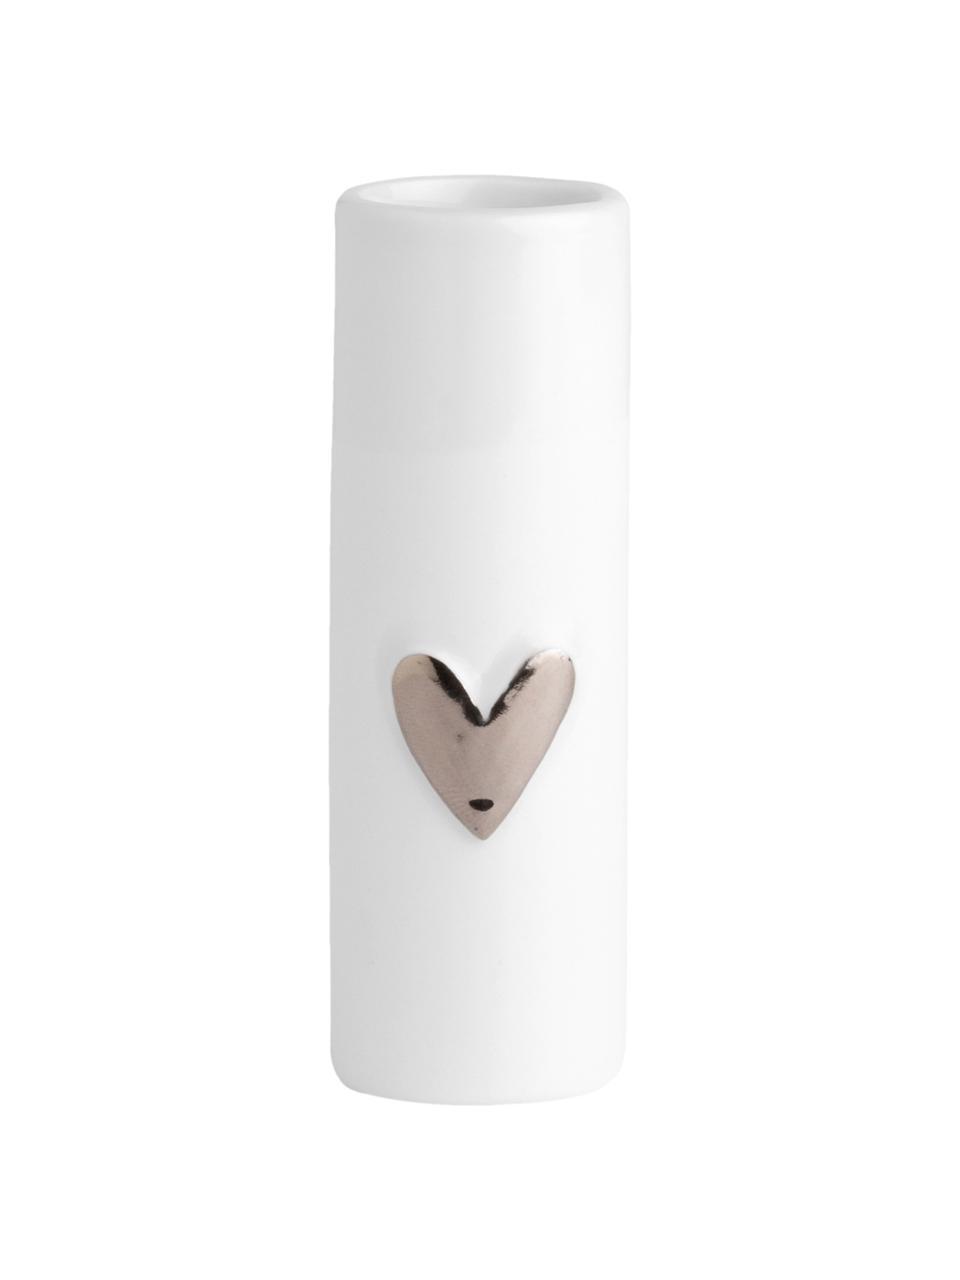 XS Porzellan-Vase Heart, 2 Stück, Porzellan, Weiß, Silberfarben, Ø 4 x H 9 cm